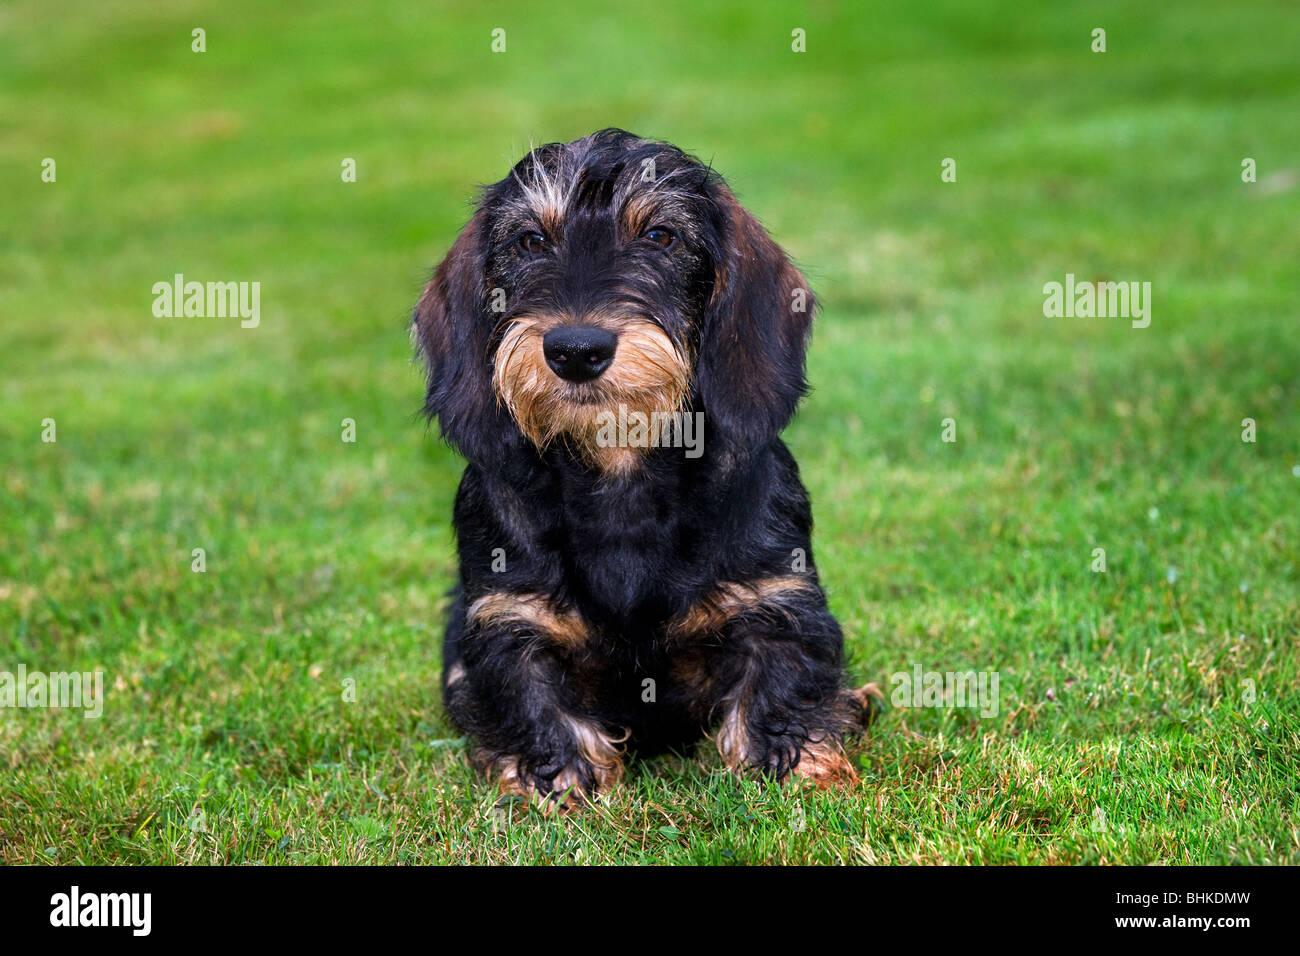 Wire-haired Wirehaired / Bassotto (Canis lupus familiaris) pup giacente sul prato in giardino Immagini Stock